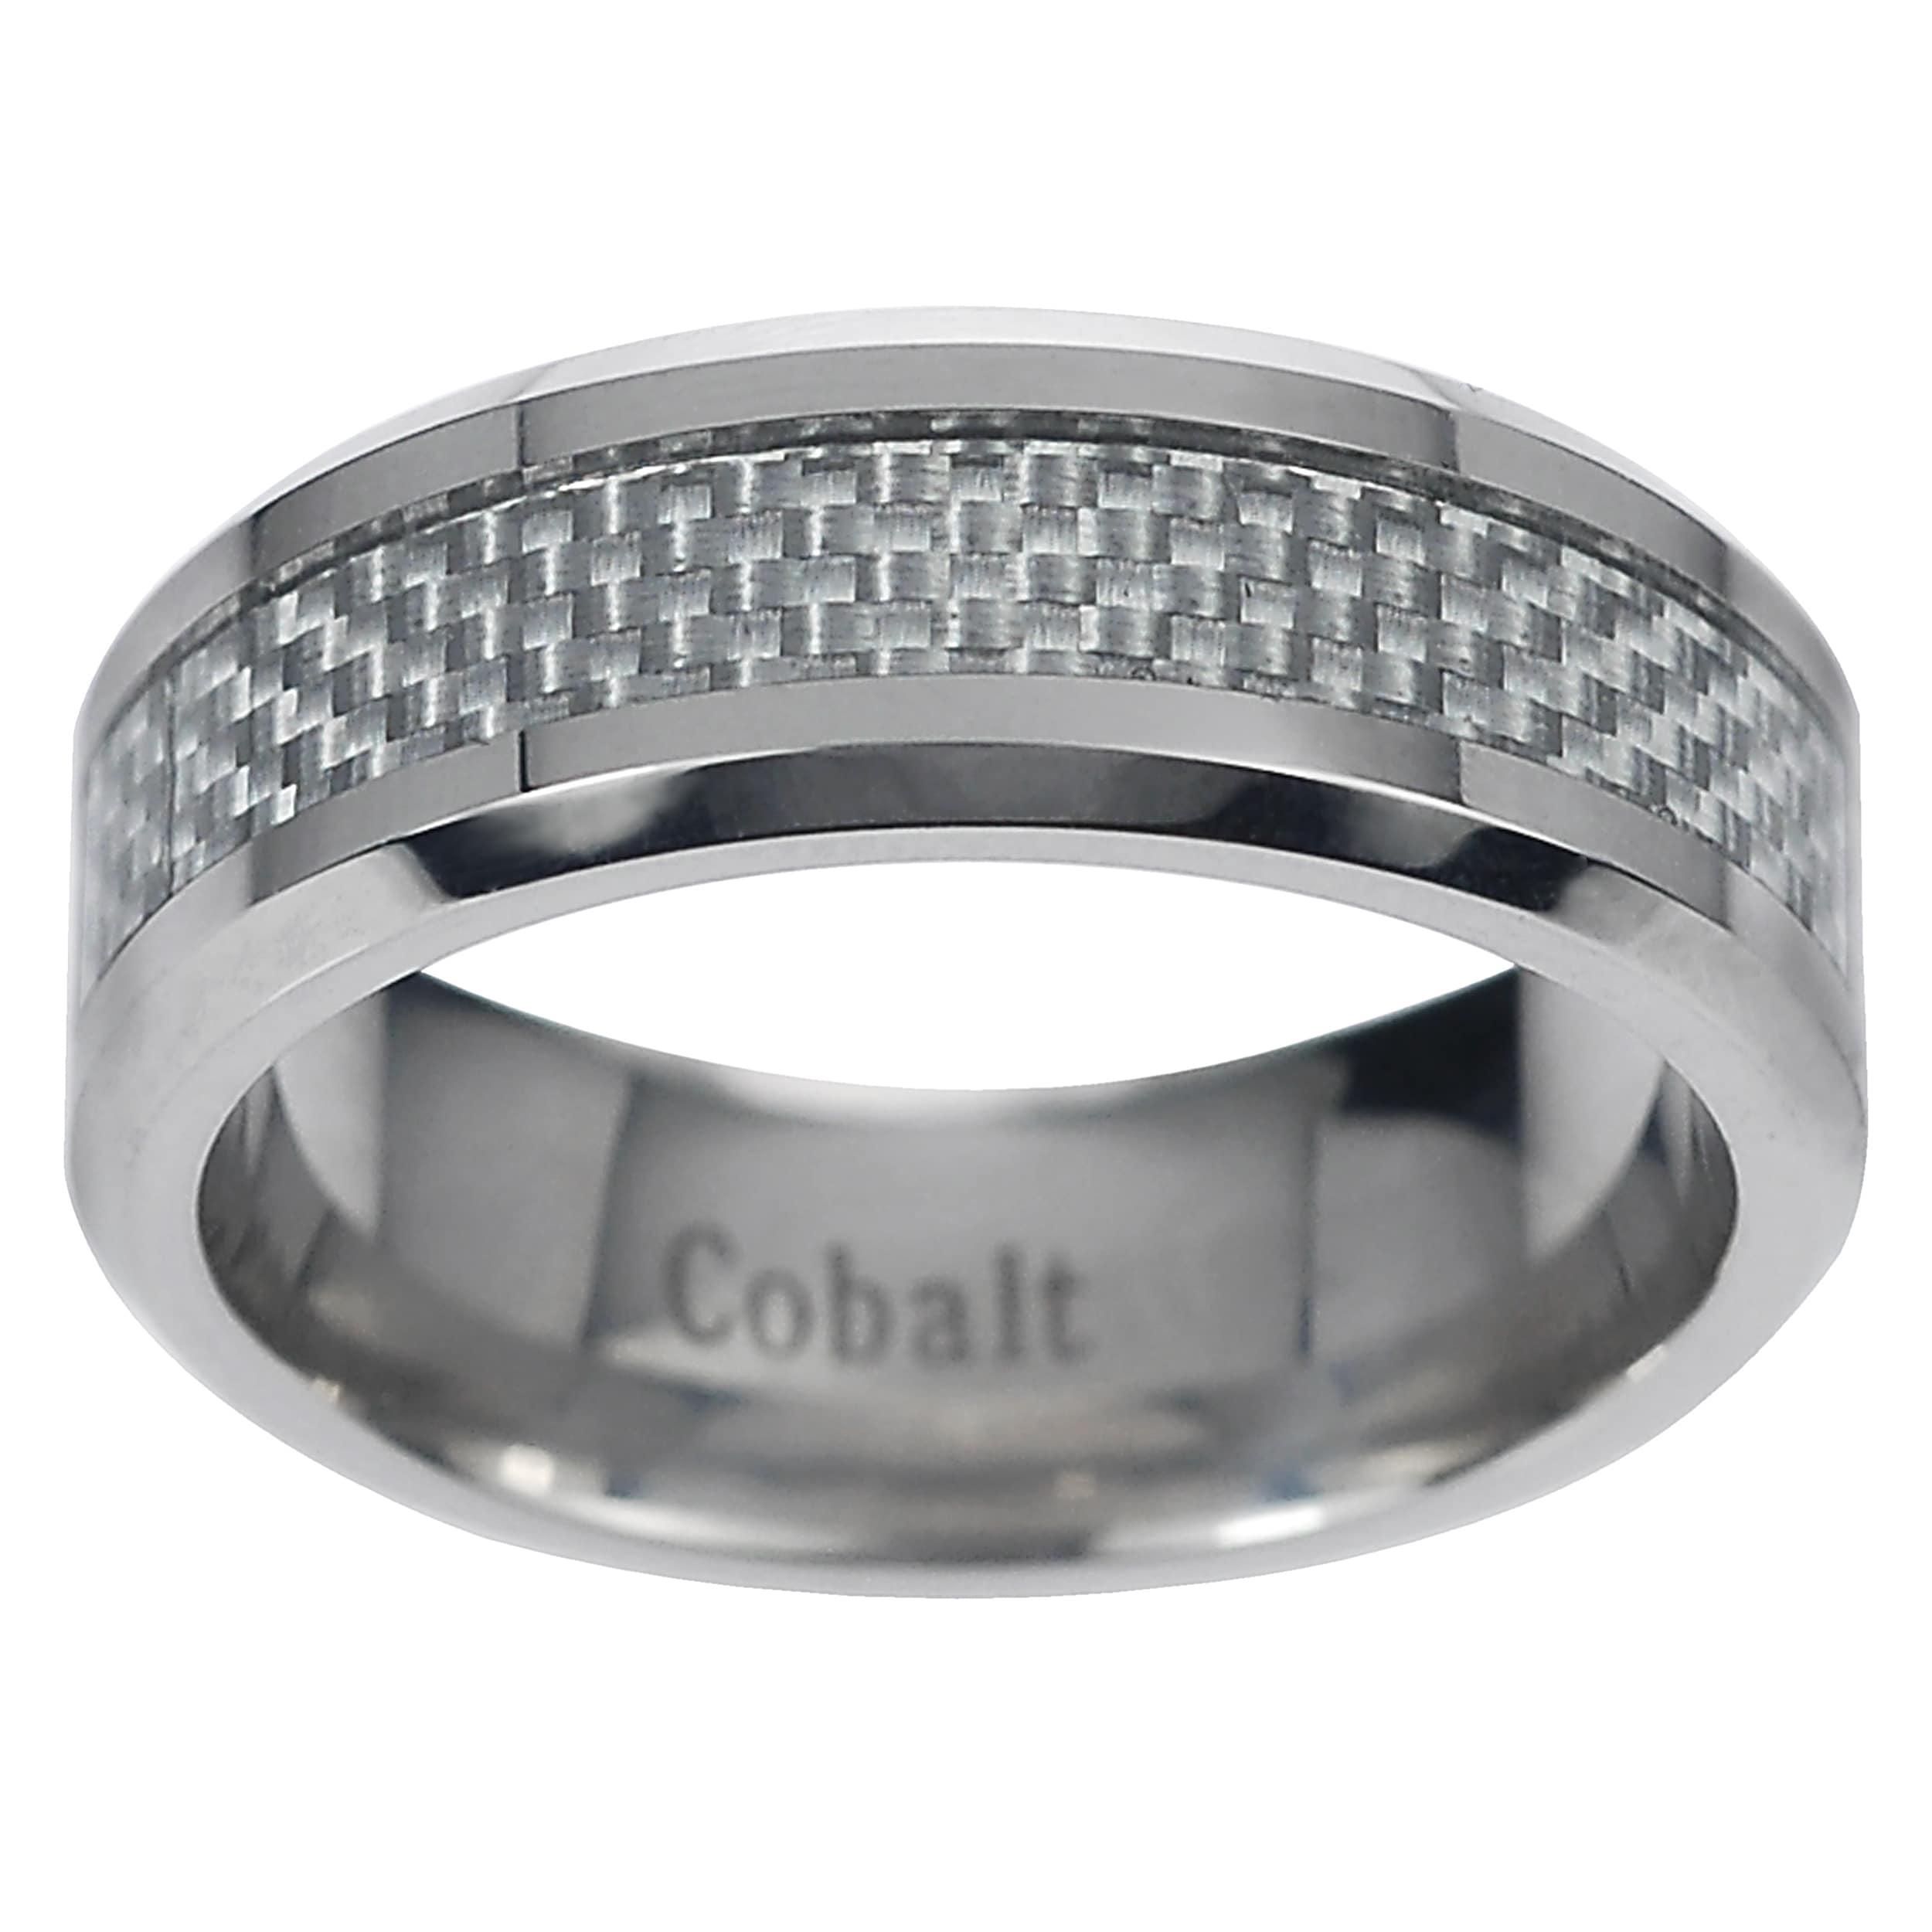 Vance Co. Men's Cobalt Grey Carbon Fiber Inlay Band (8 mm...